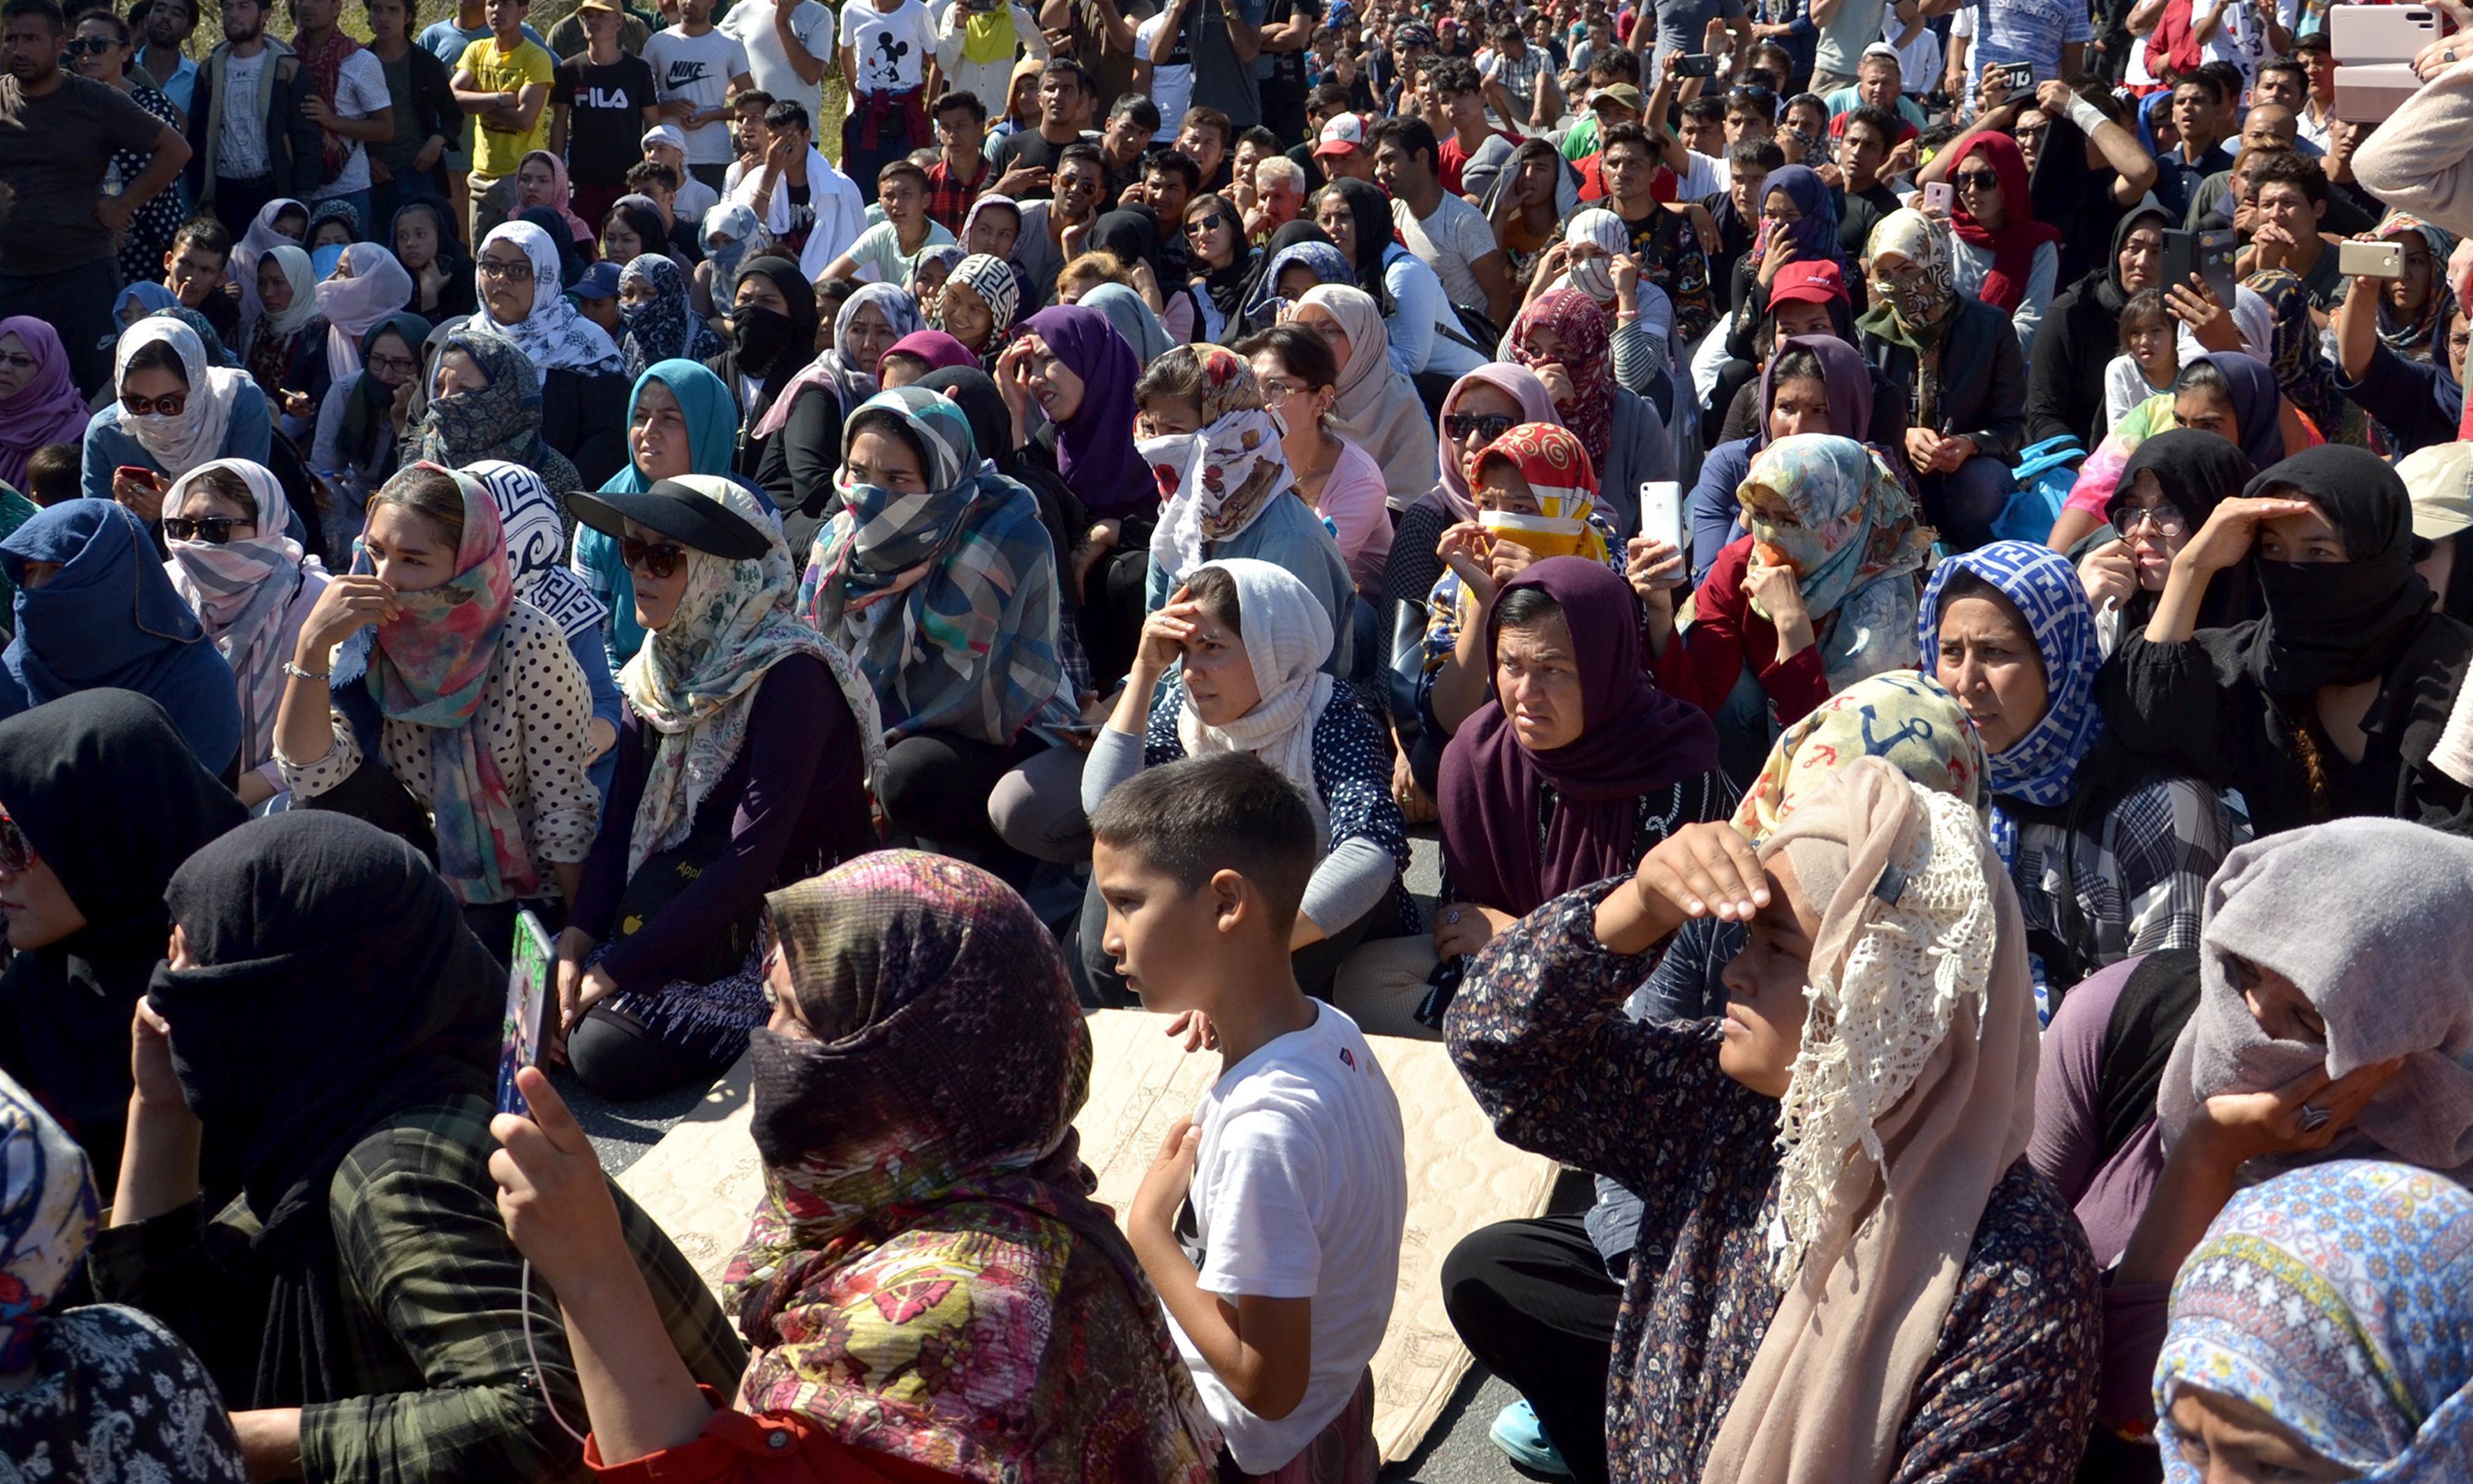 Action needed on refugee children in Greece